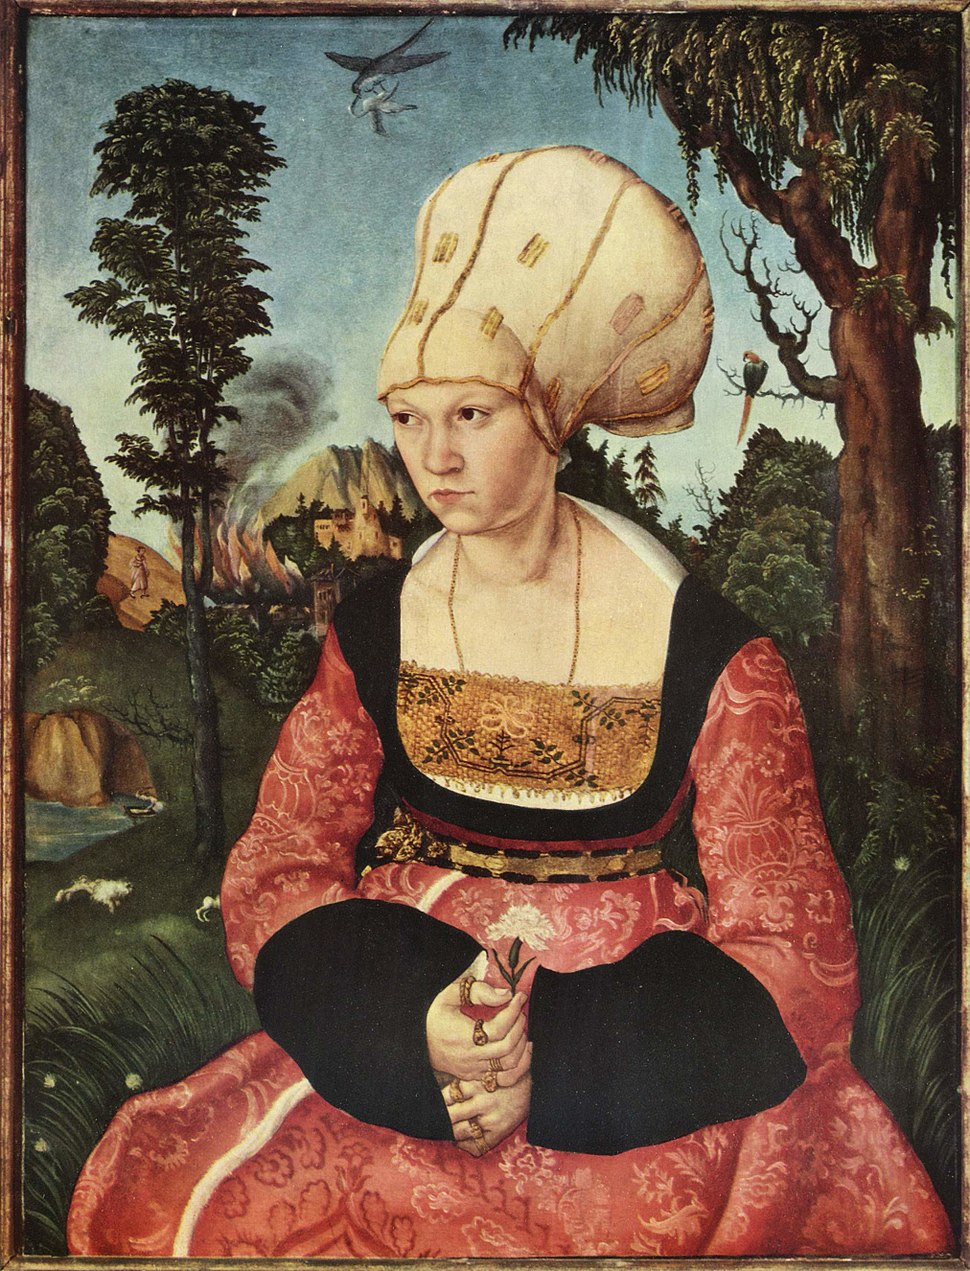 Lucas Cranach (I) - Anna Cuspinian